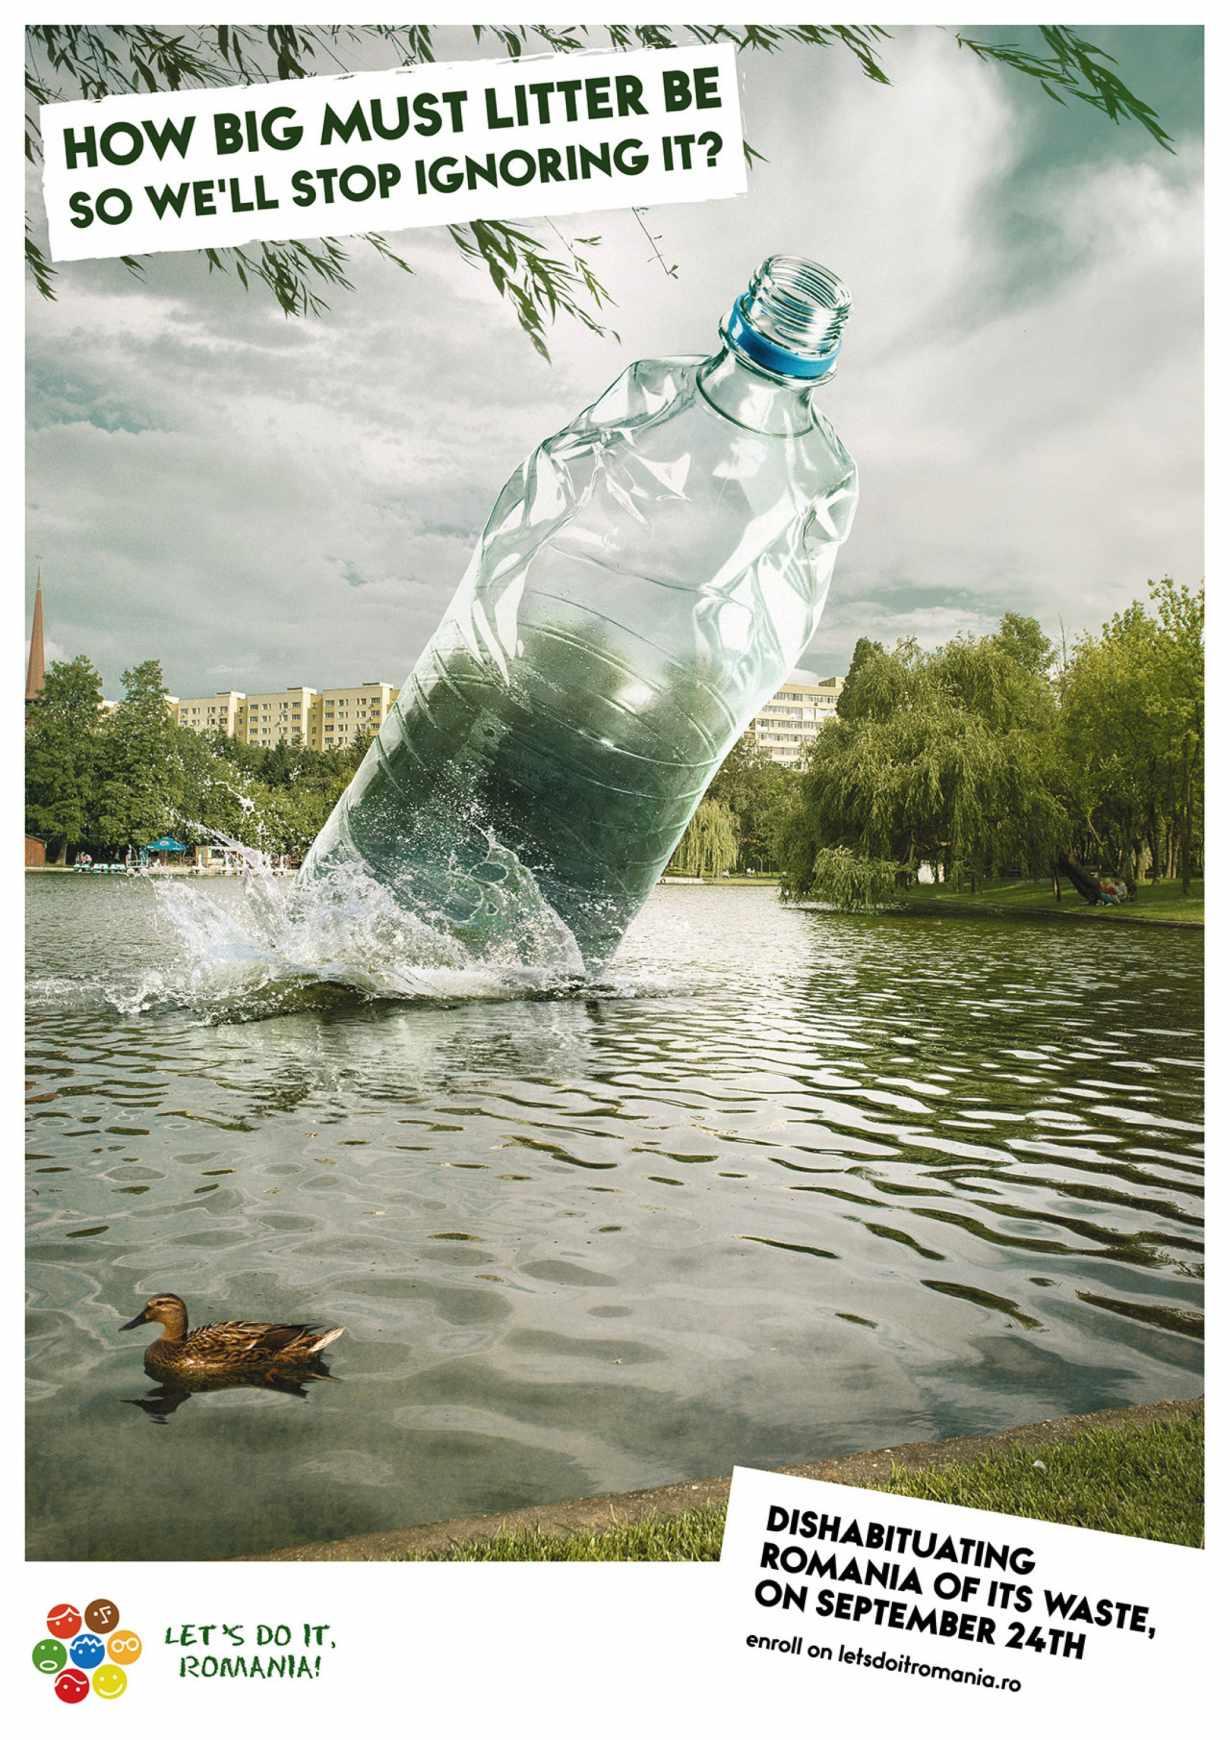 dans-ta-pub-publicite-affiche-creation-print-lundi-139-8